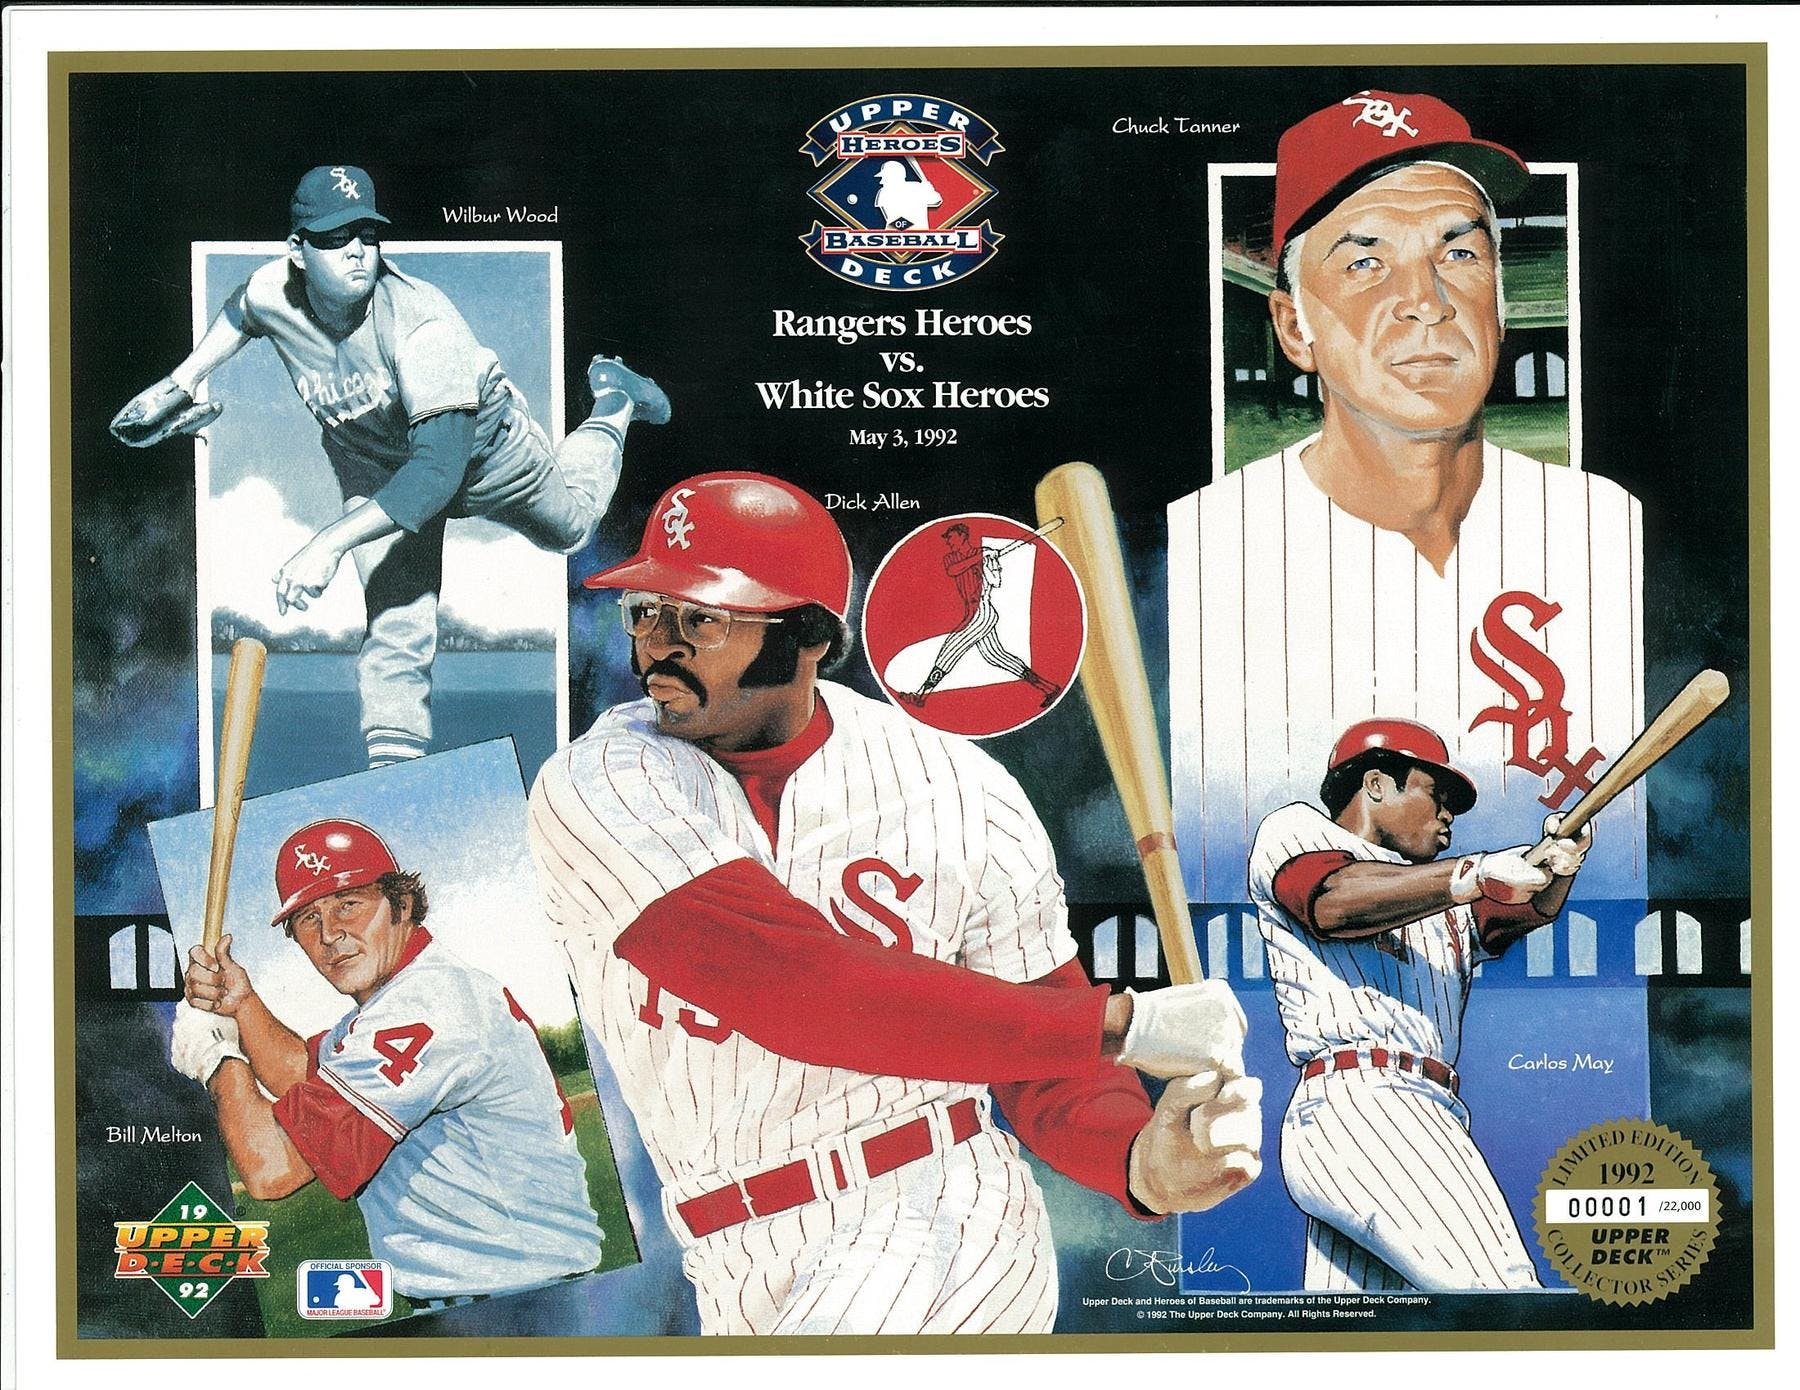 1992 Upper Deck Heroes Of Baseball Chicago White Sox Commemorative Sheet